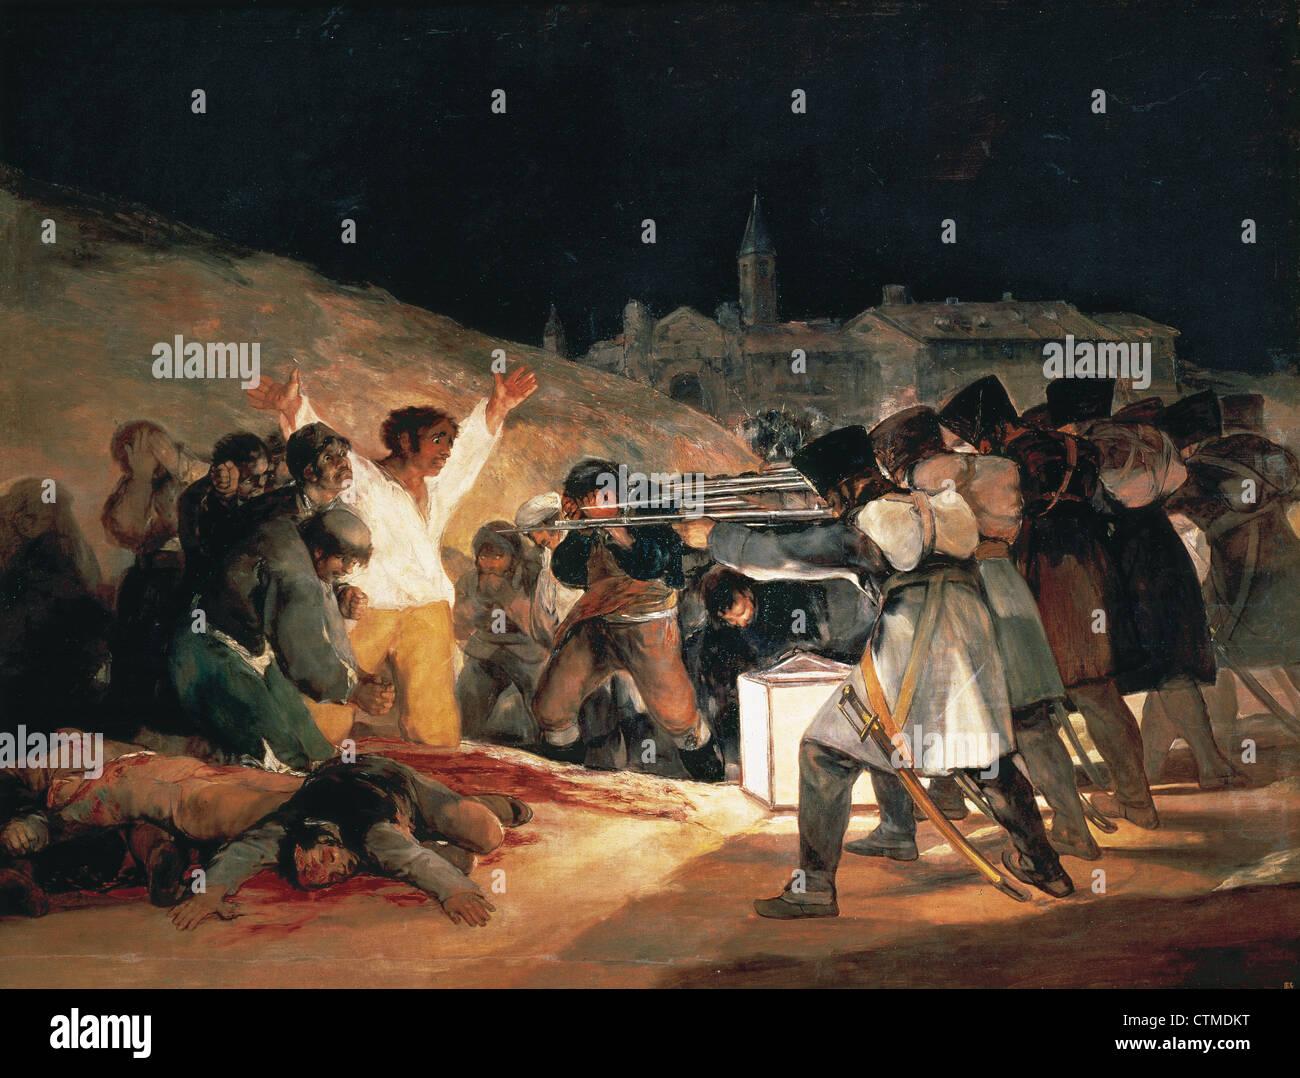 Francisco de Goya (1746-1828). Spanish romantic painter. The Third of May 1808. Oil on Canvas, 1814. Prado Museum. - Stock Image